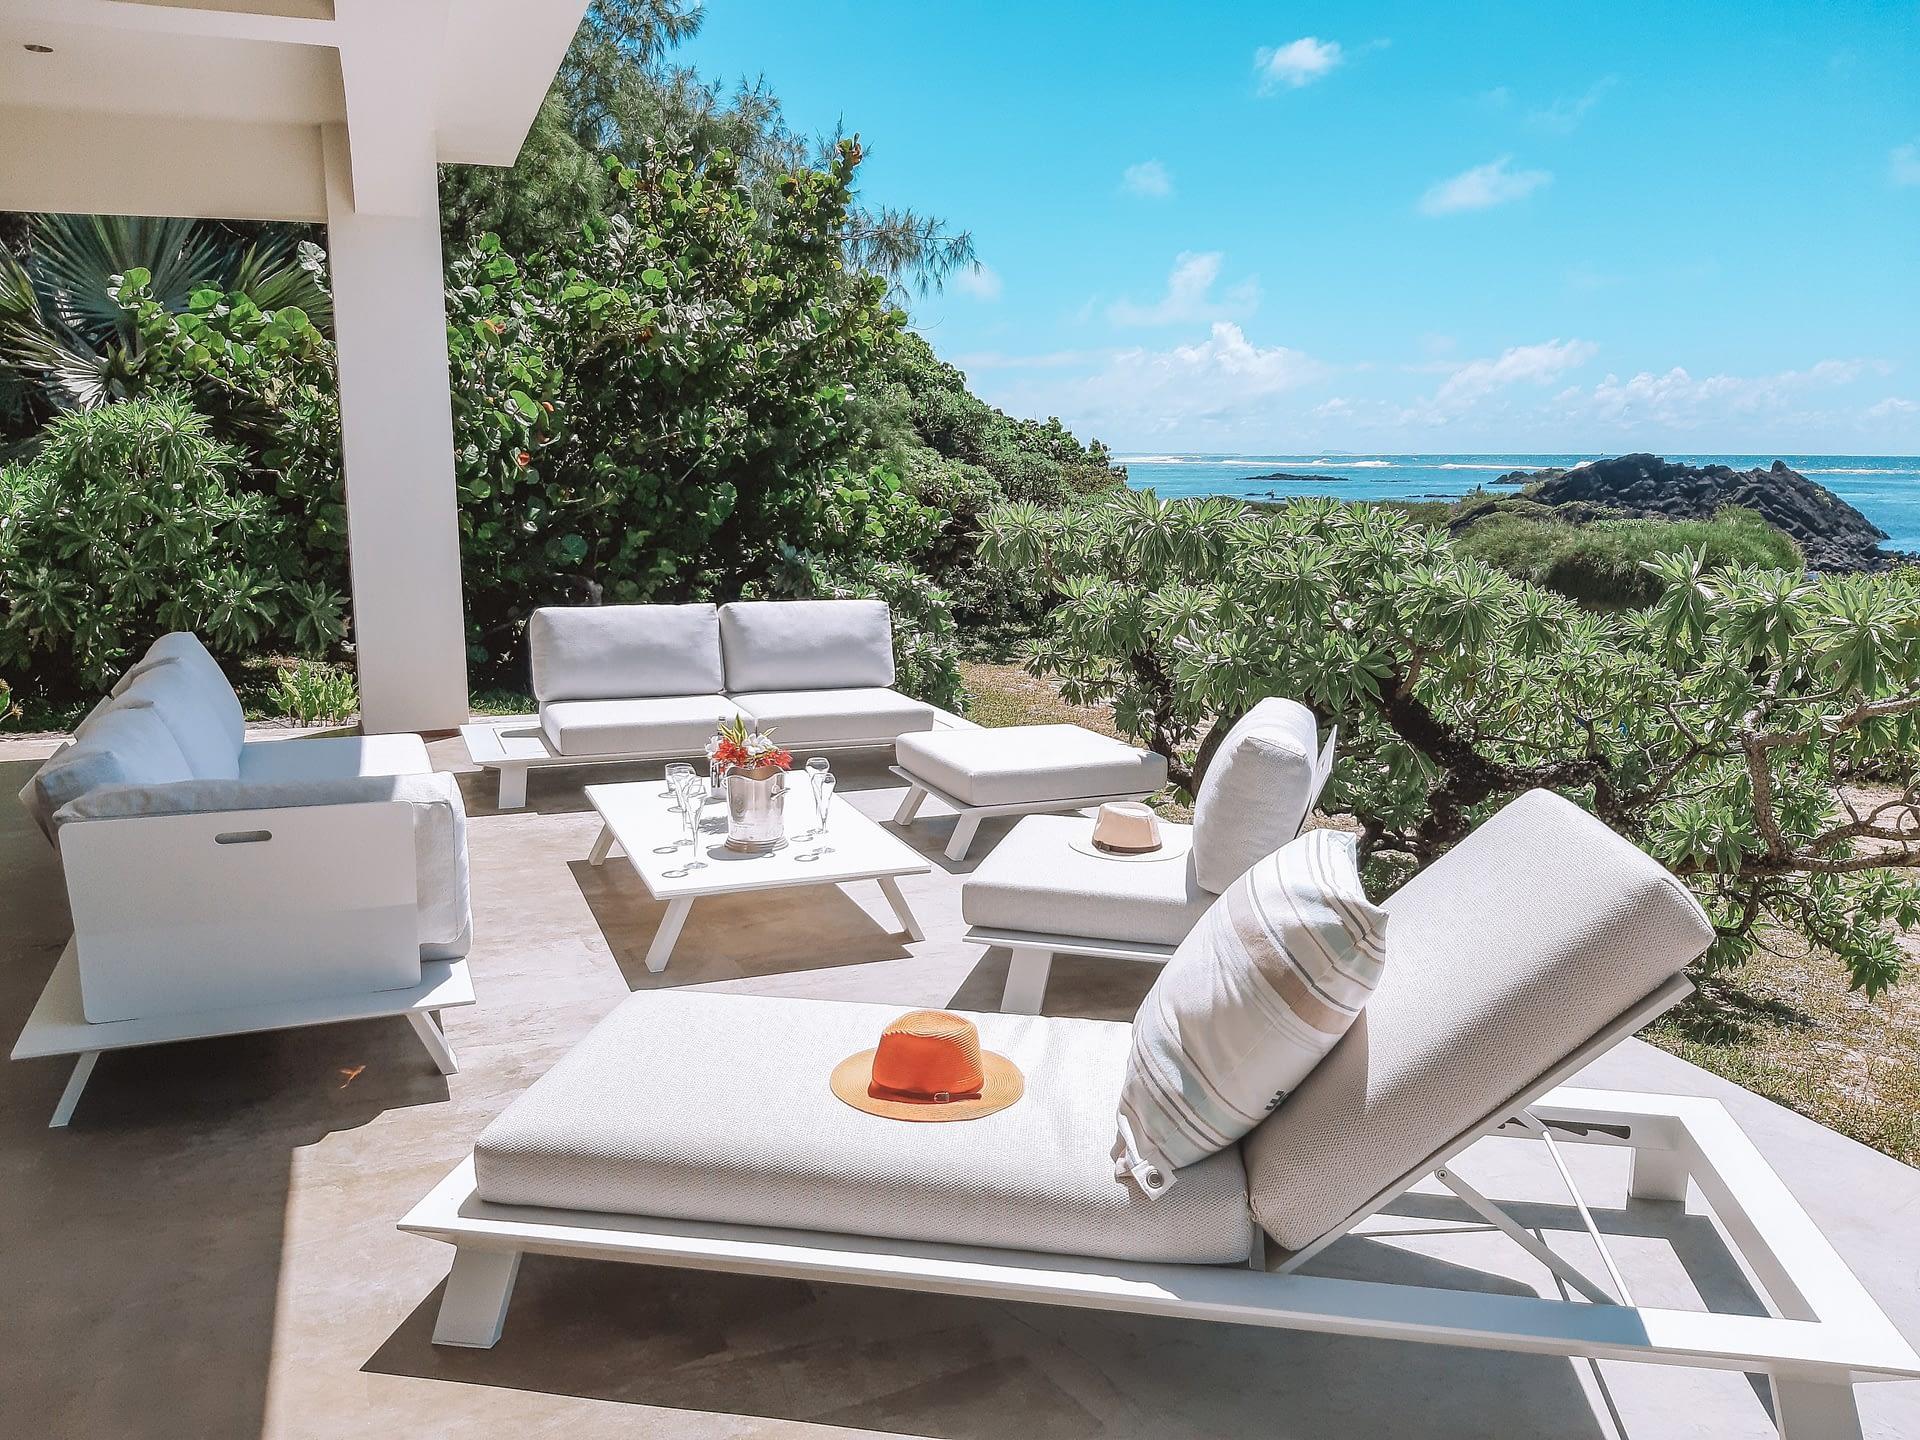 Villa Brisas beachfront outdoor seating area